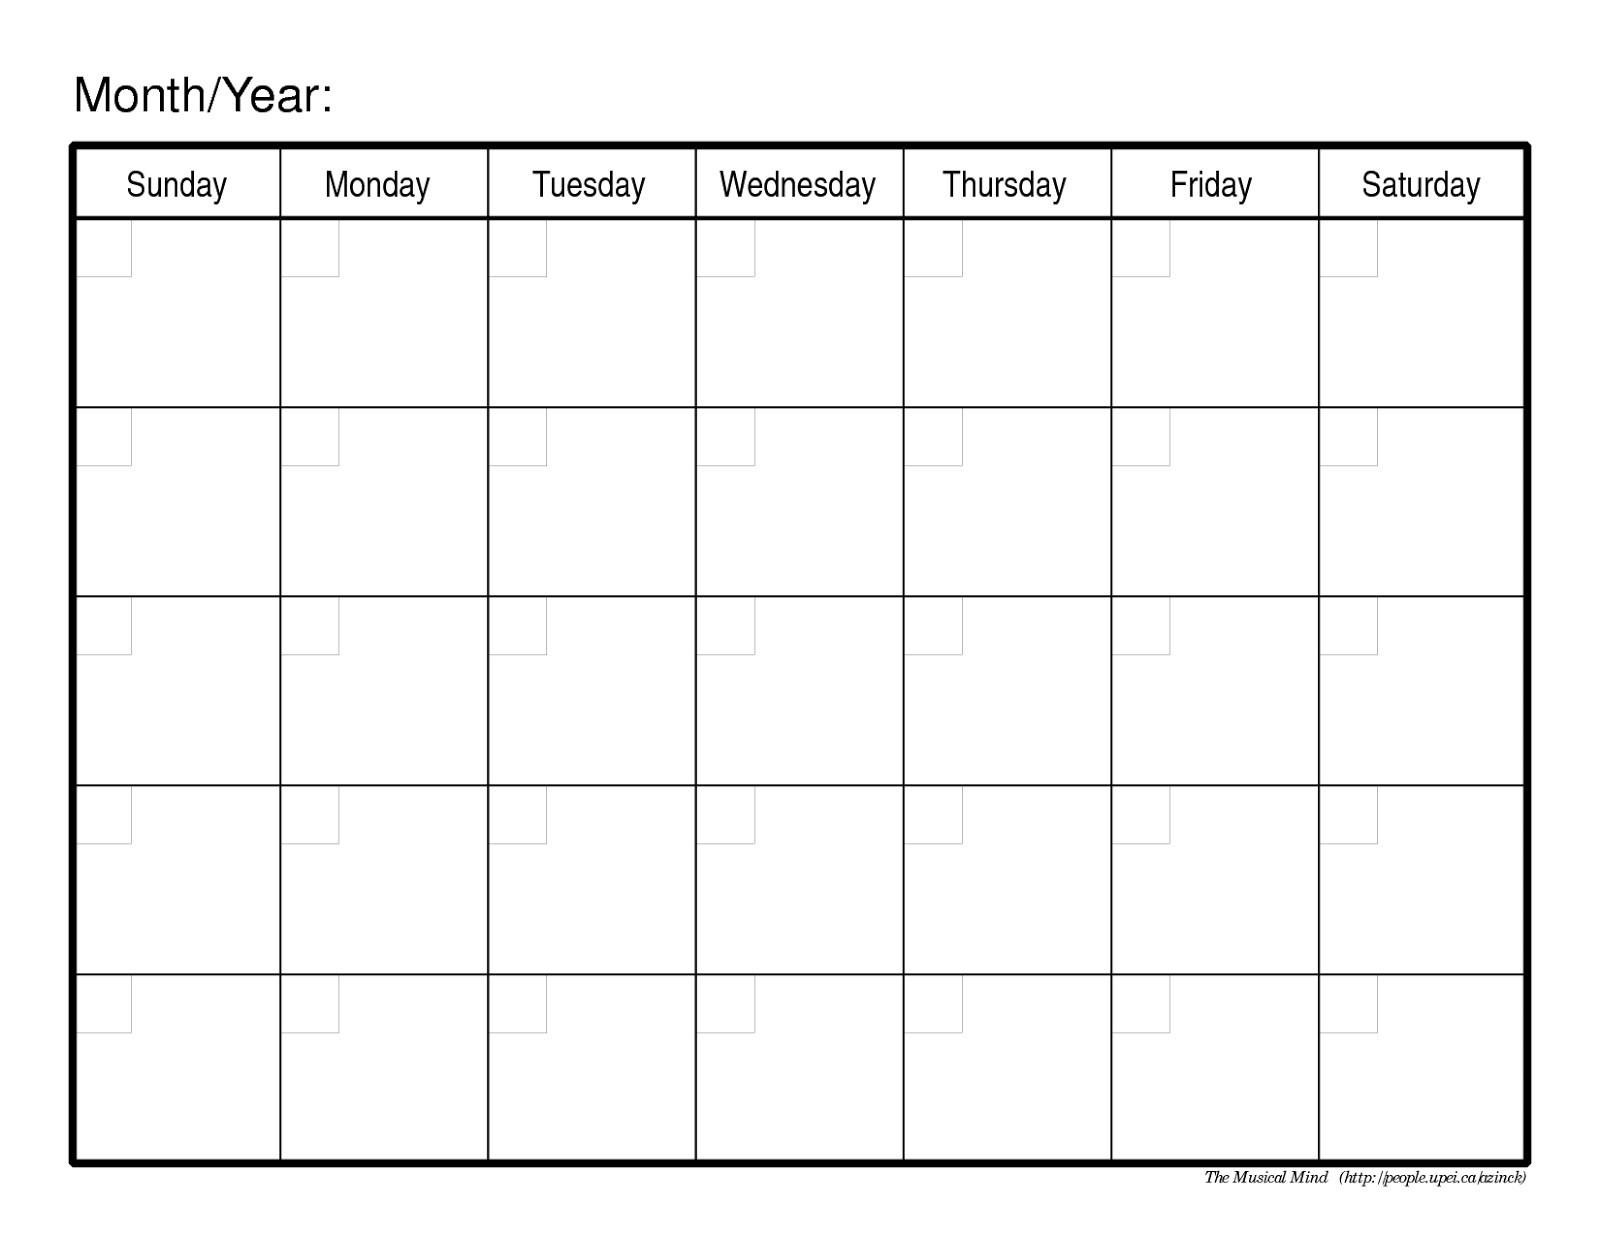 Monthly Calendar No Dates • Printable Blank Calendar Template-Monthly Calendar Printable No Dates